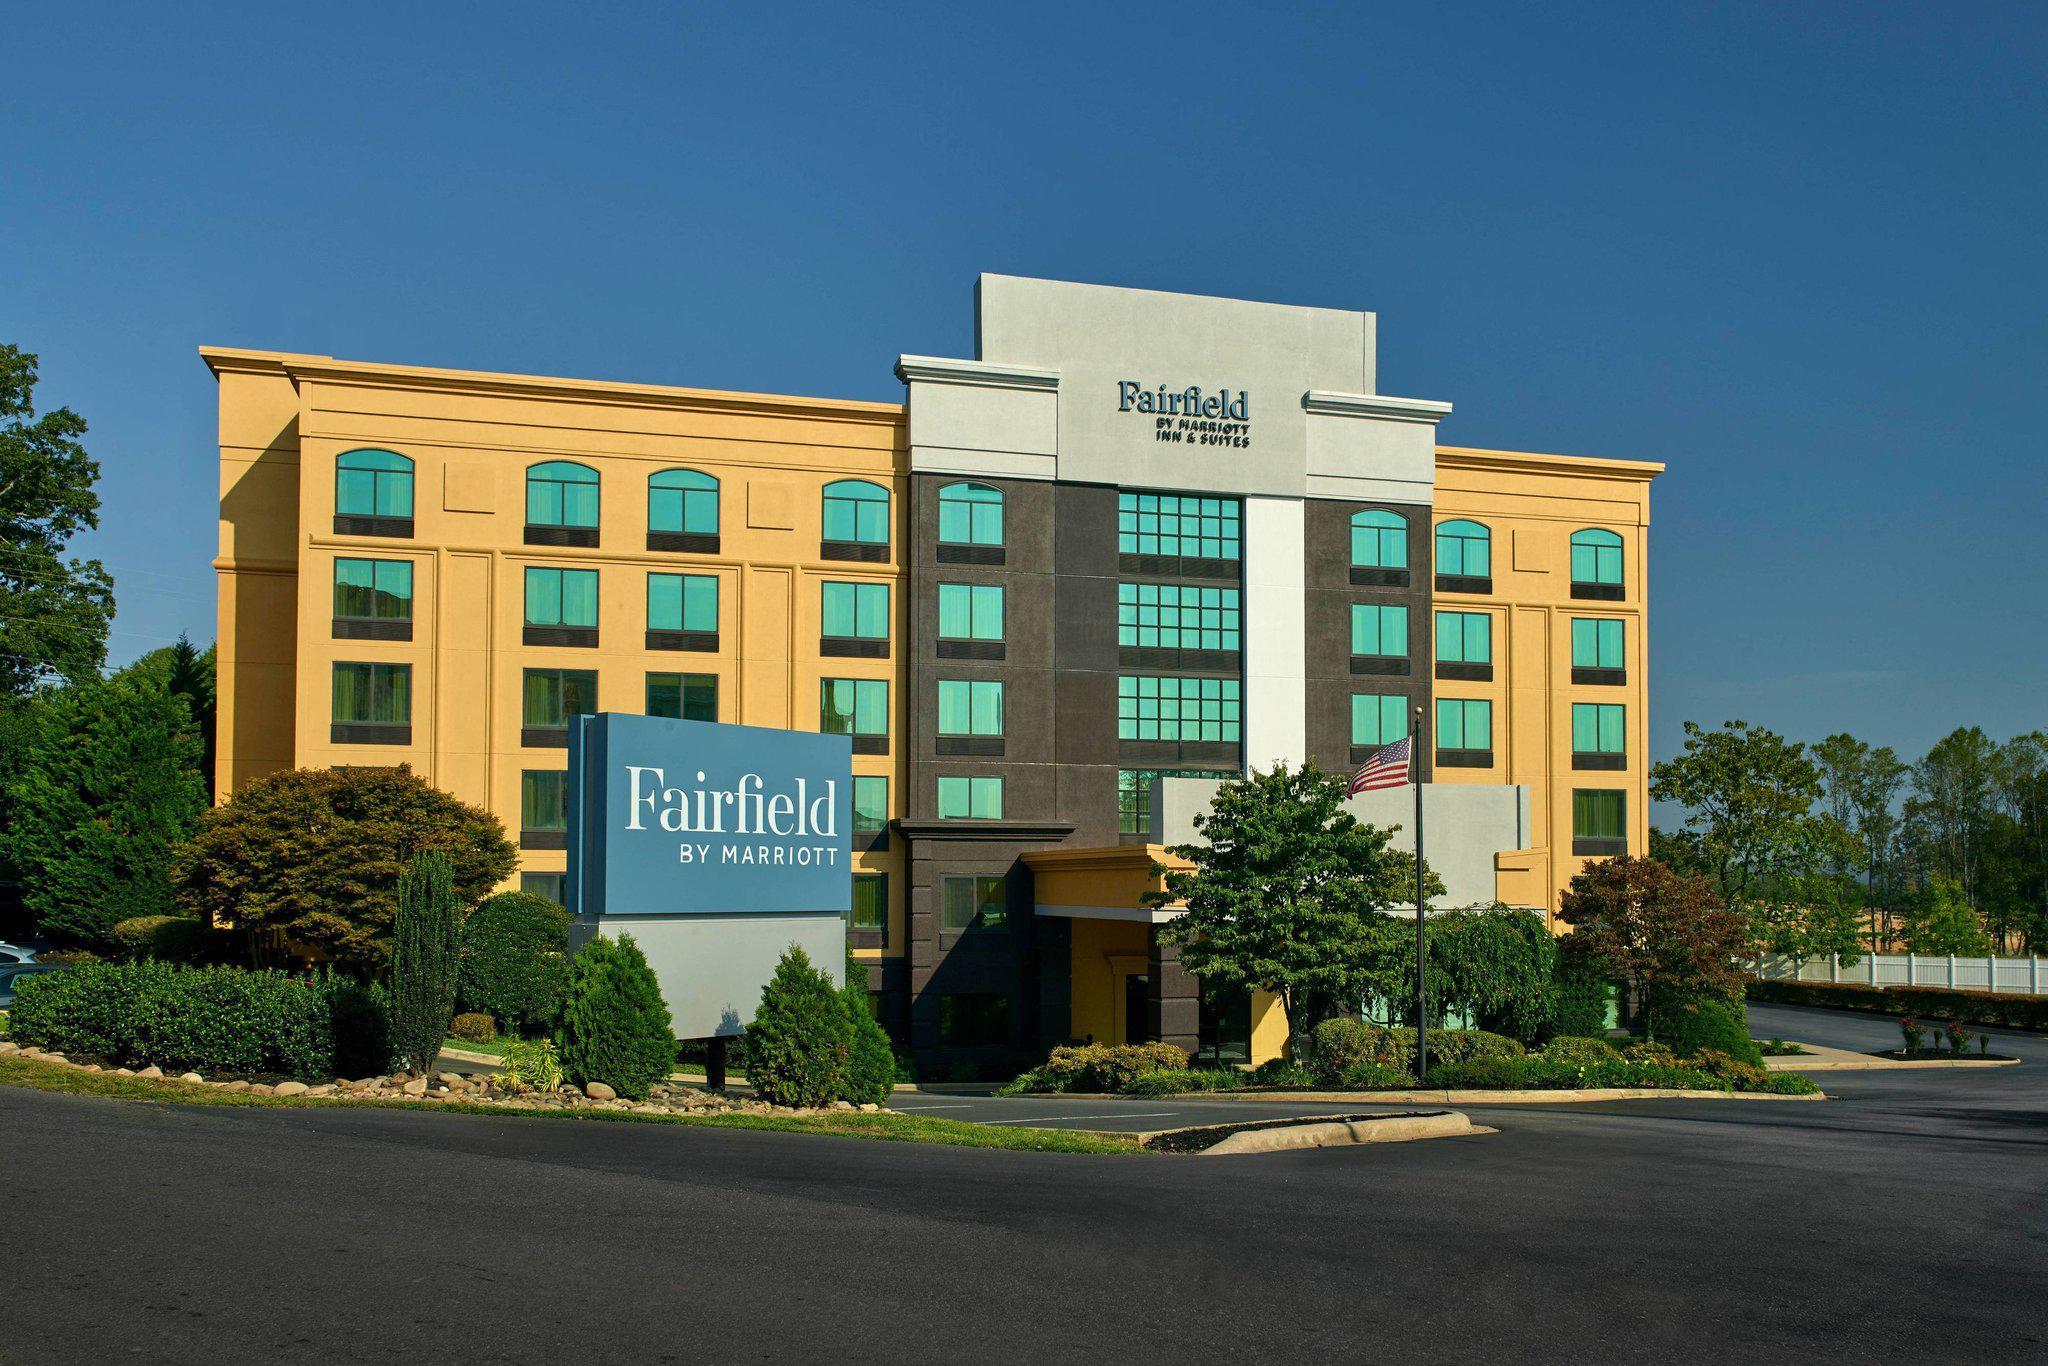 Fairfield Inn & Suites by Marriott Asheville Outlets